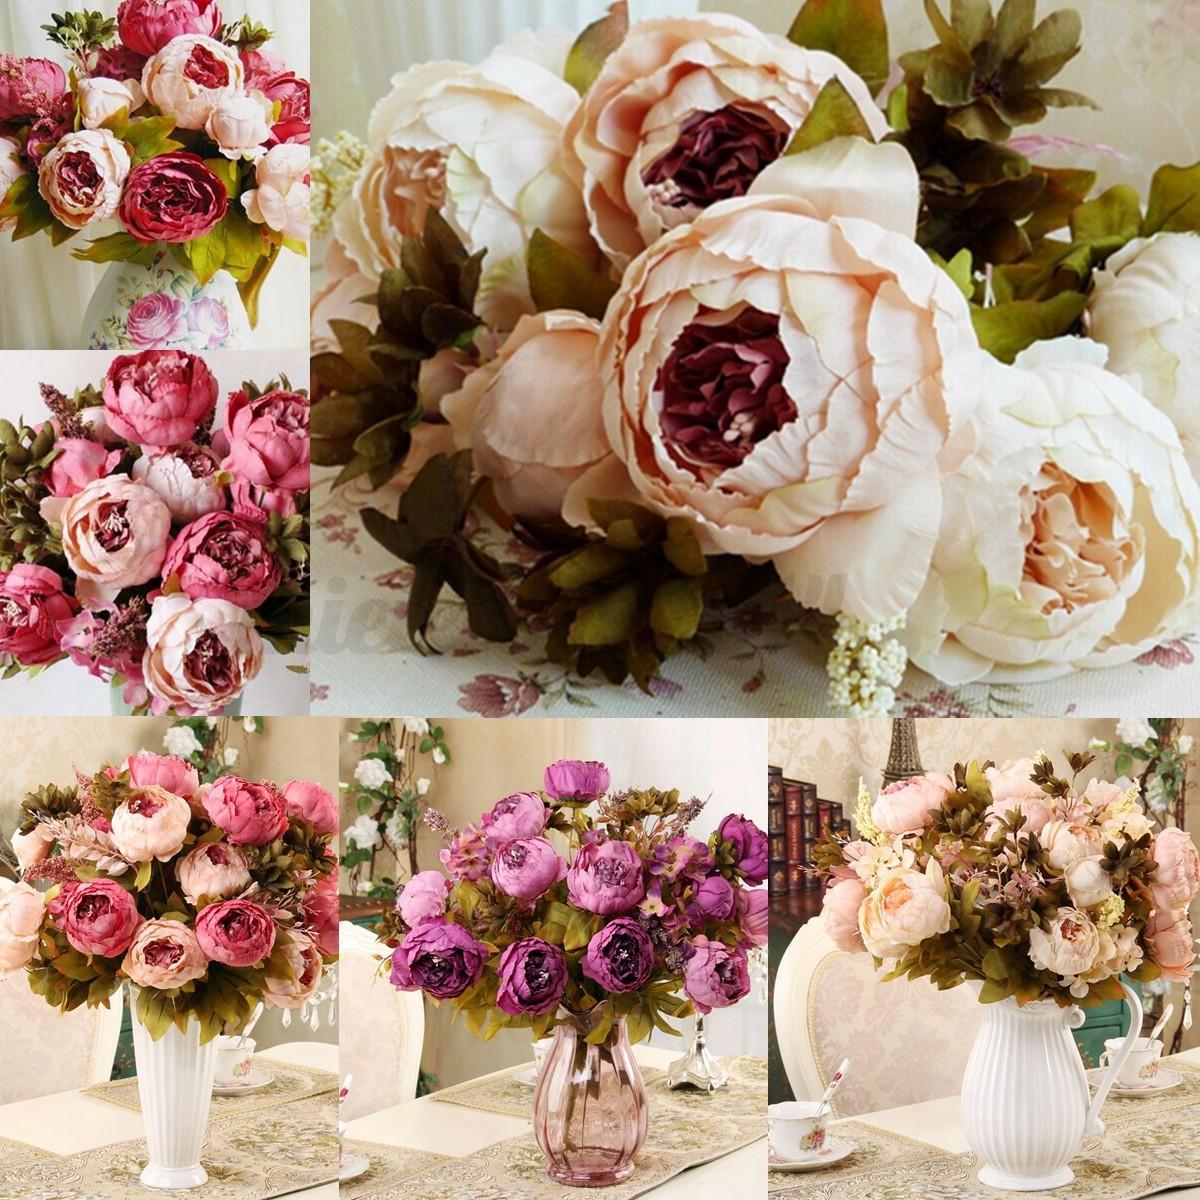 Snap 1 Bouquet Artificial Peony Silk Flowers Bridal Hydrangea